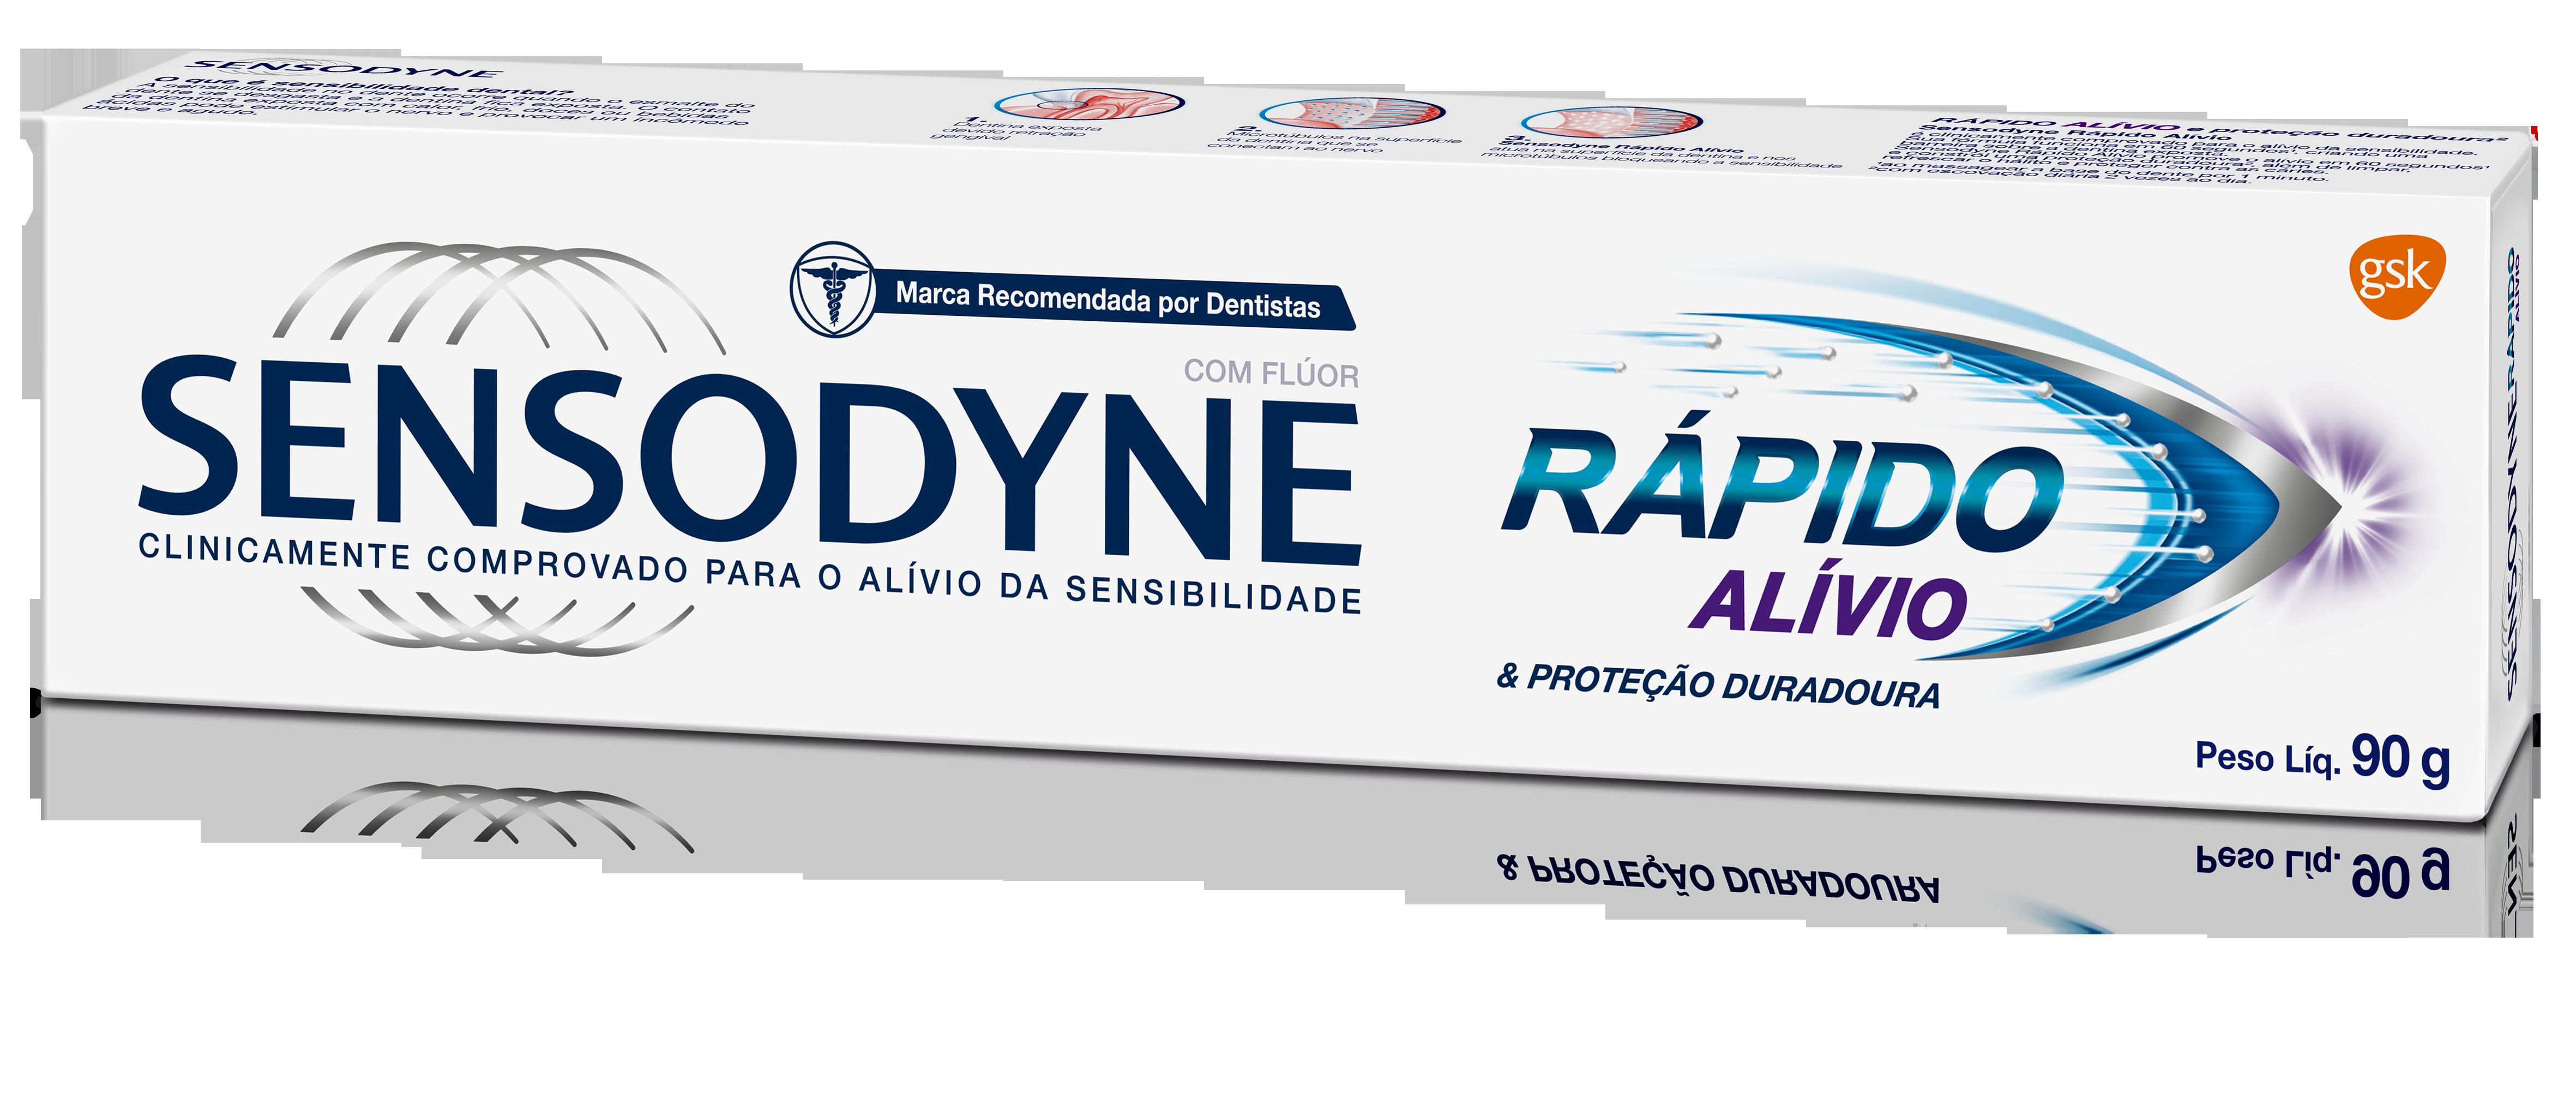 SENSODYNE CD RAPIDO ALIVIO 1X90G (60)